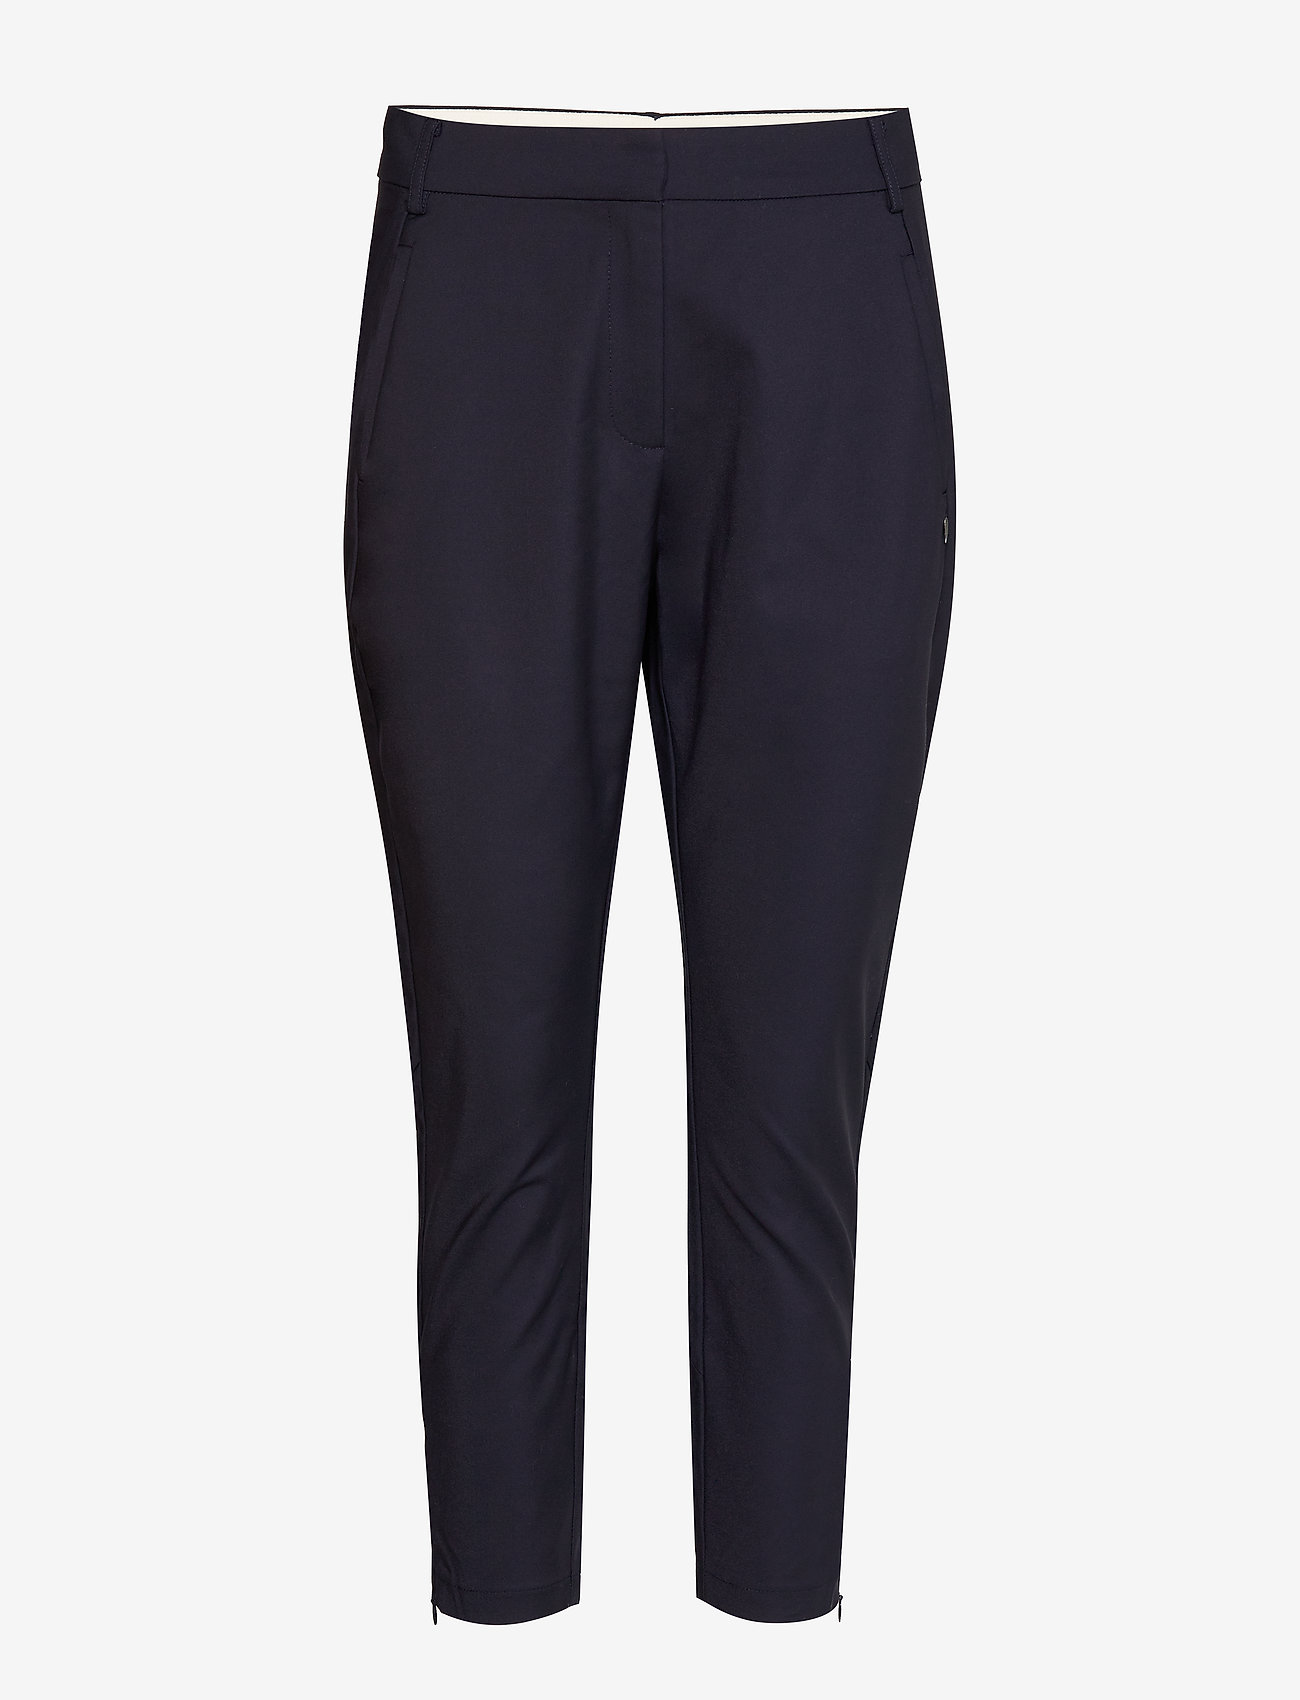 Coster Copenhagen - 7/8 pants - Stella - raka byxor - night sky blue - 0